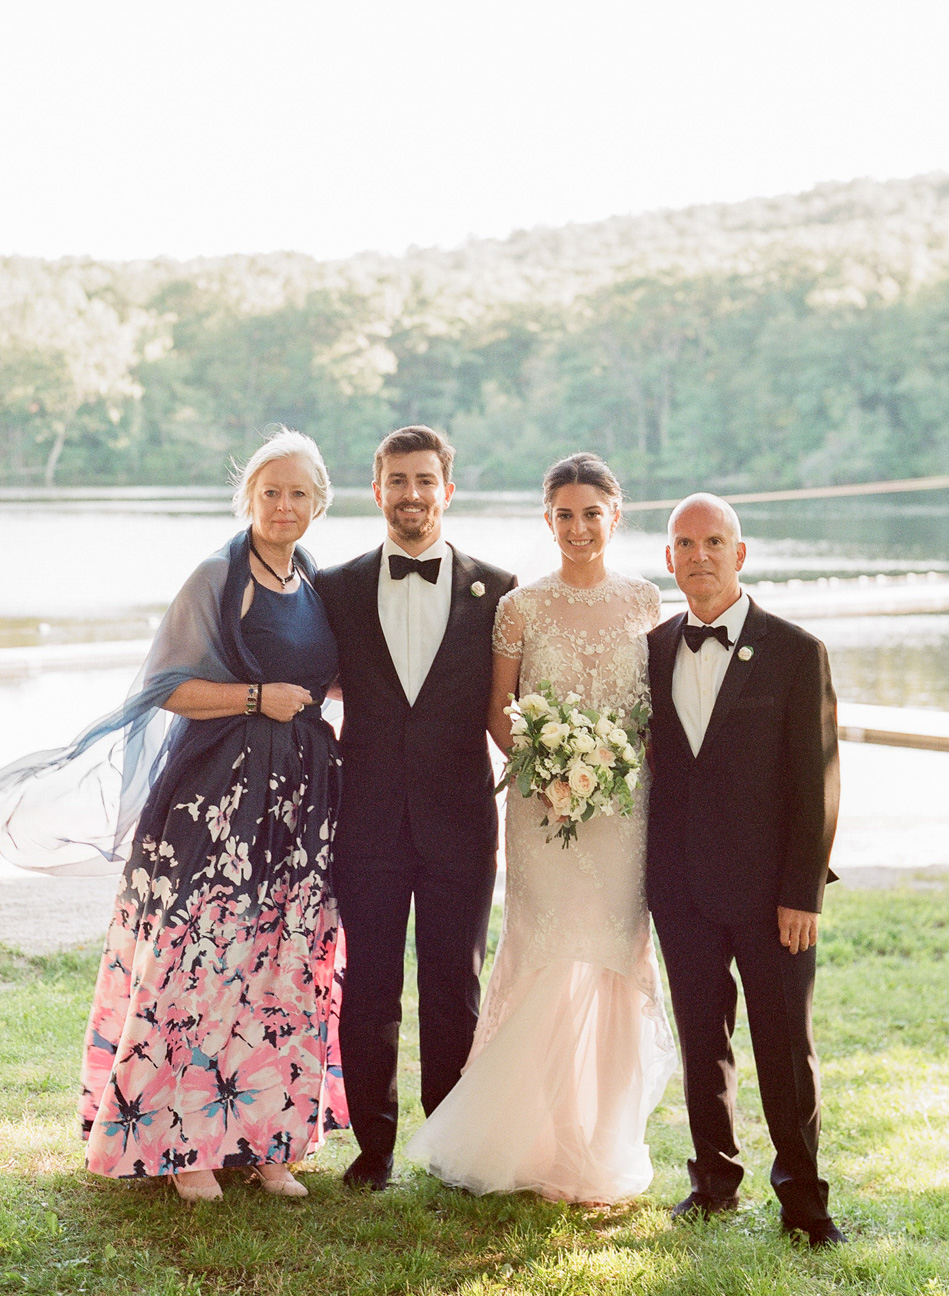 KarenHillPhotography-Parizat-Wedding-0367.jpg